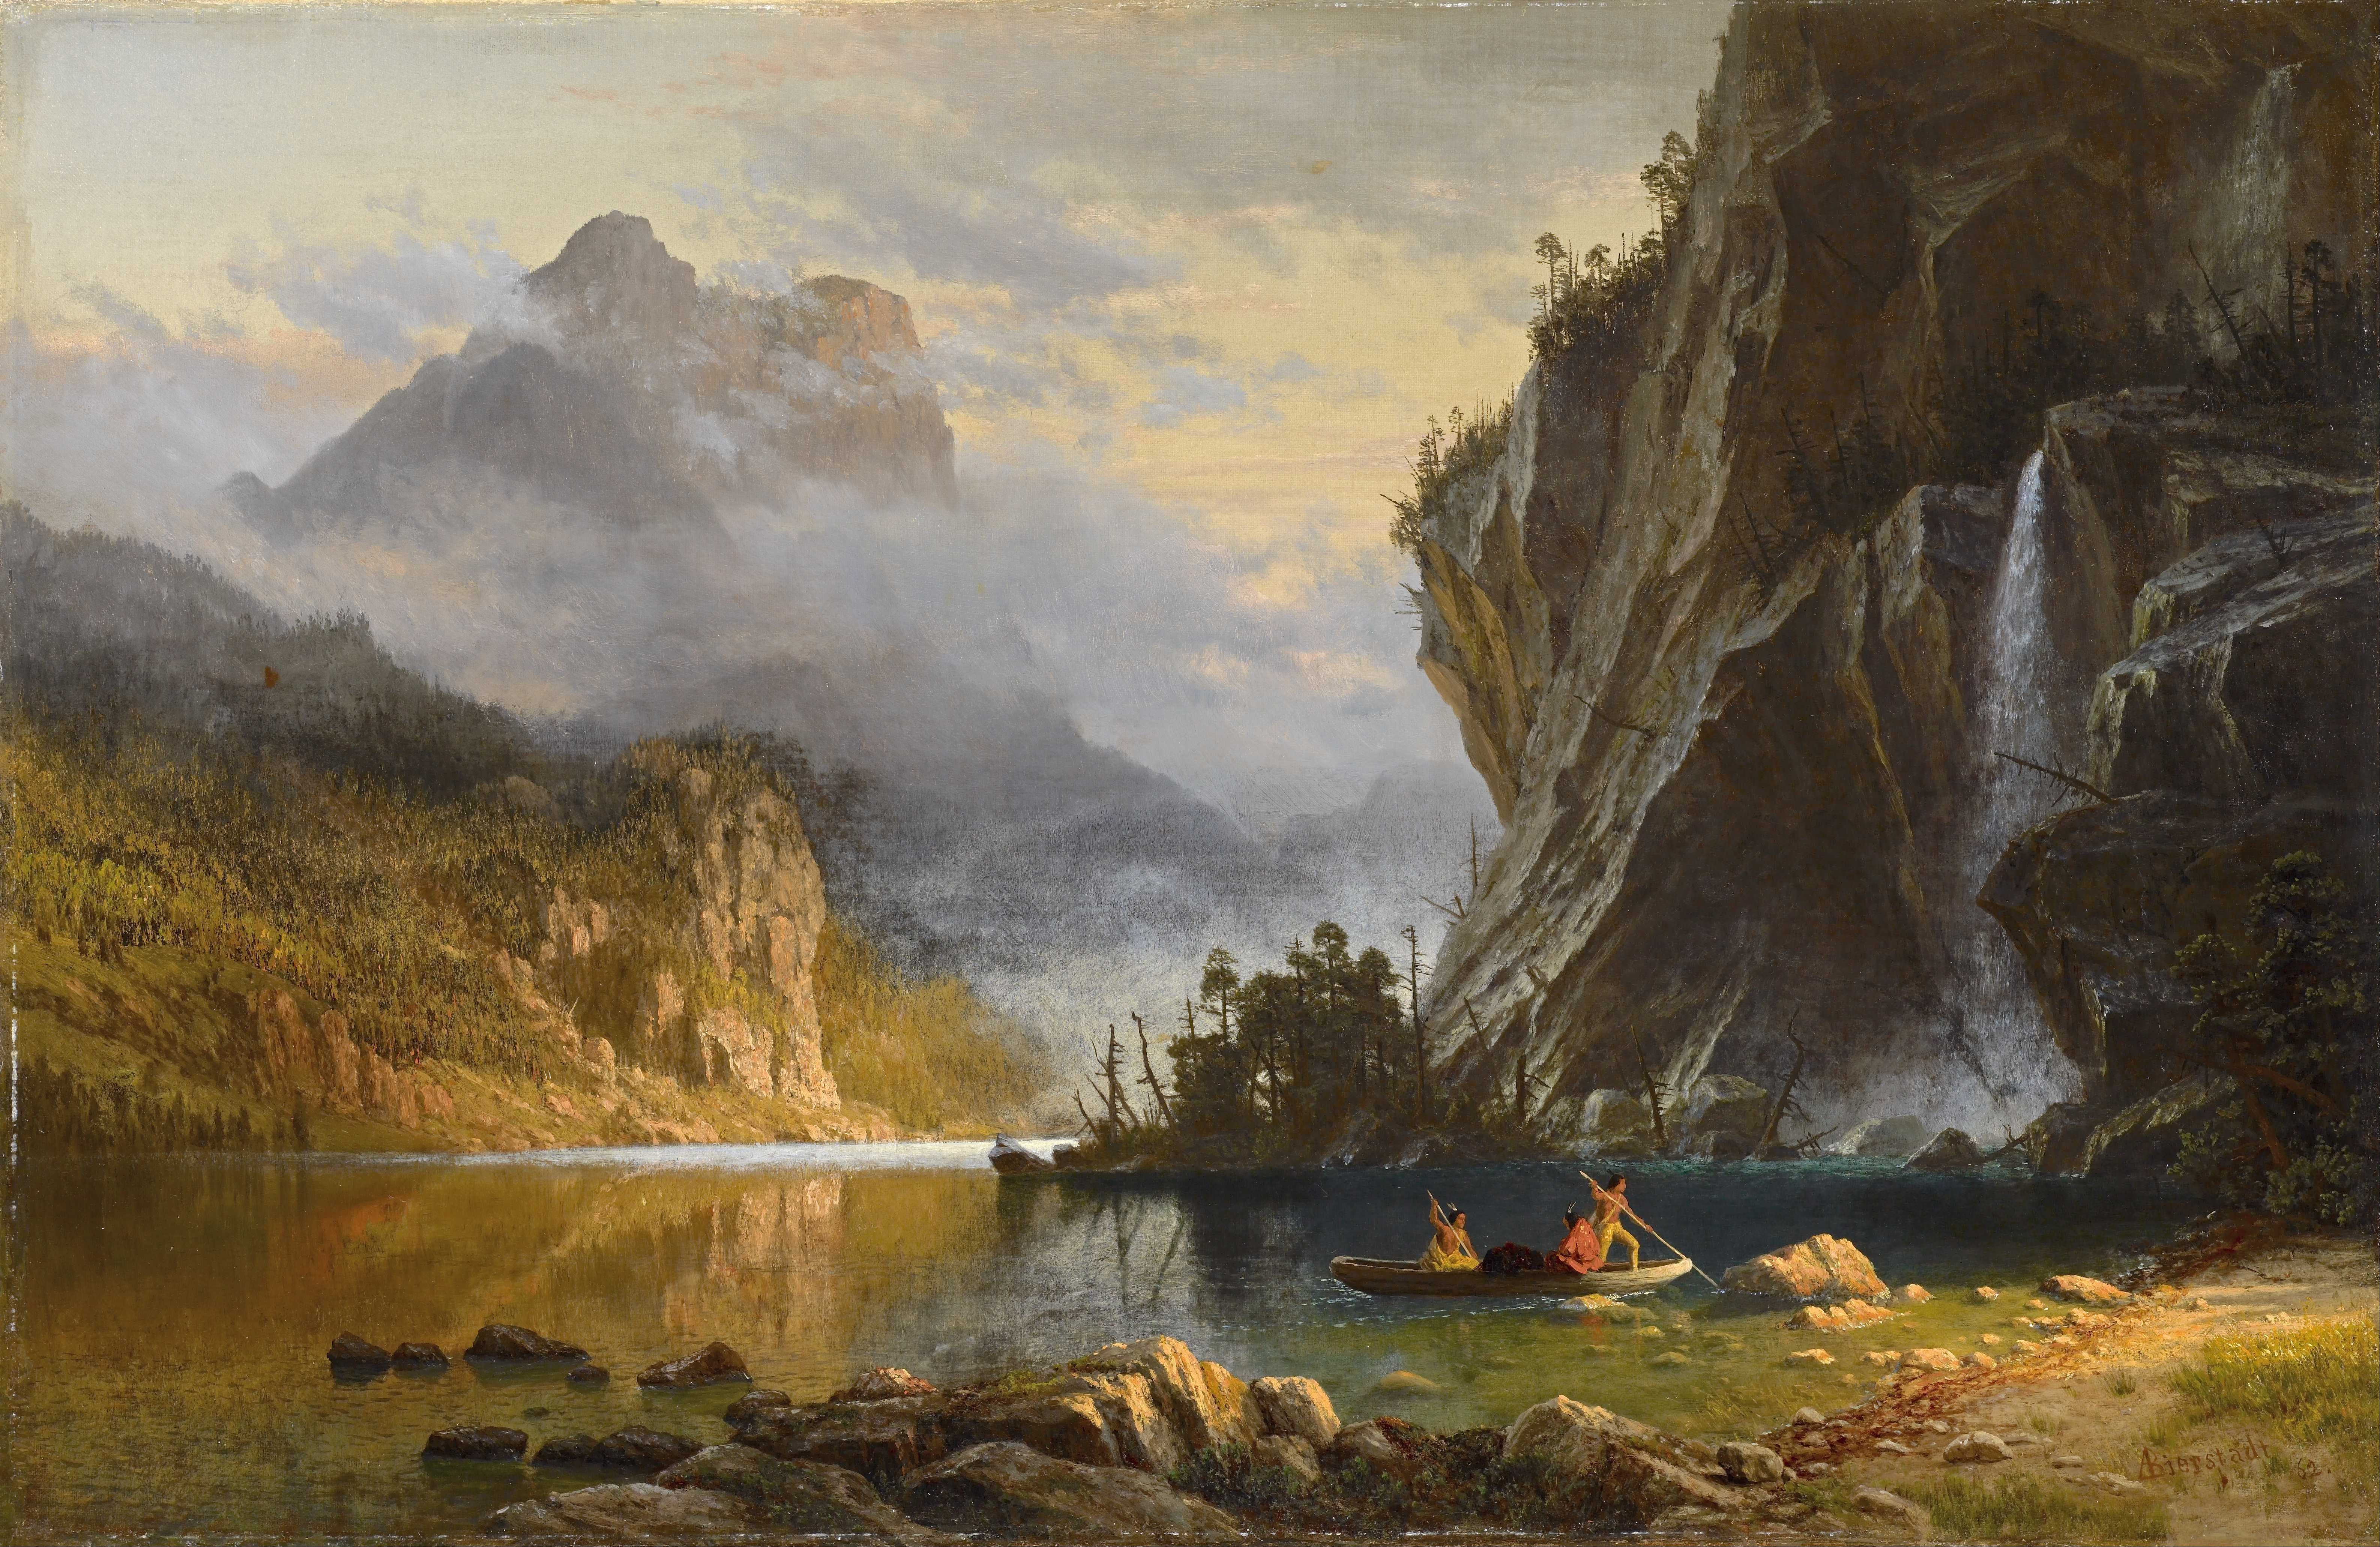 Albert bierstadt most famous paintings indians spear